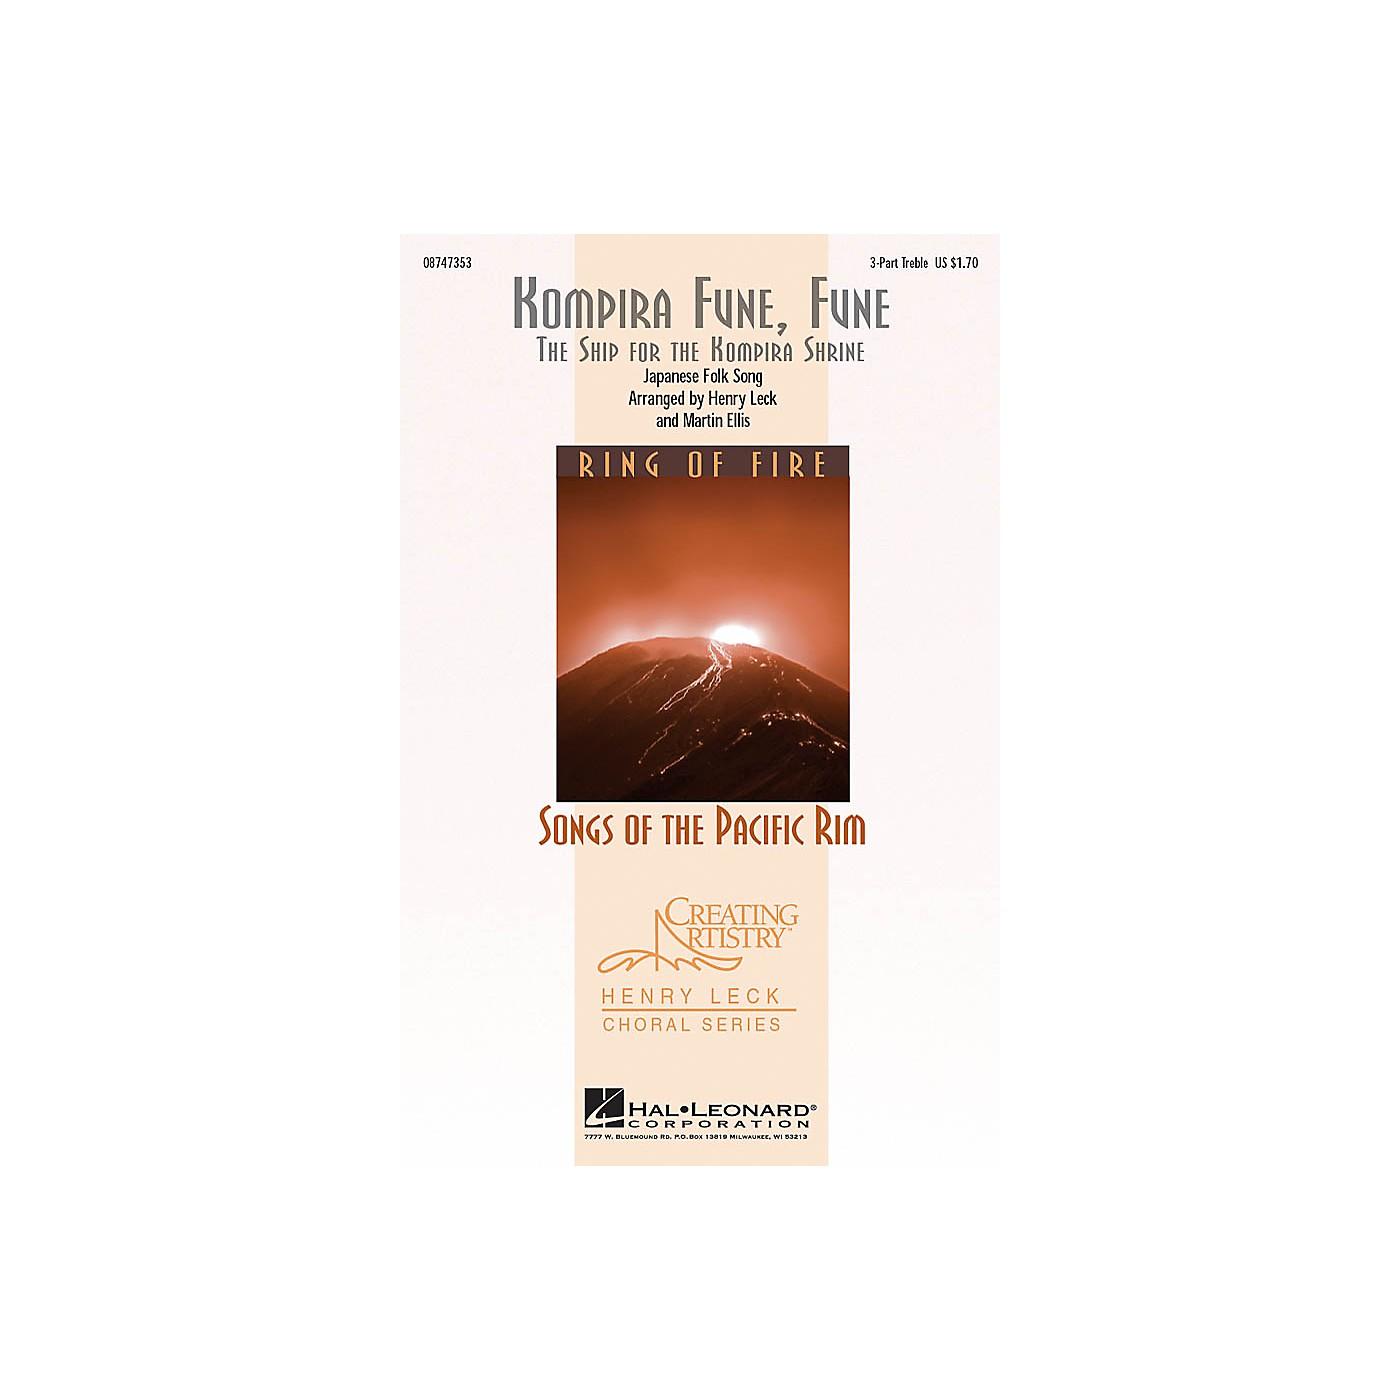 Hal Leonard Kompira Fune, Fune (The Ship for the Kompira Shrine) 3 Part Treble arranged by Henry Leck thumbnail